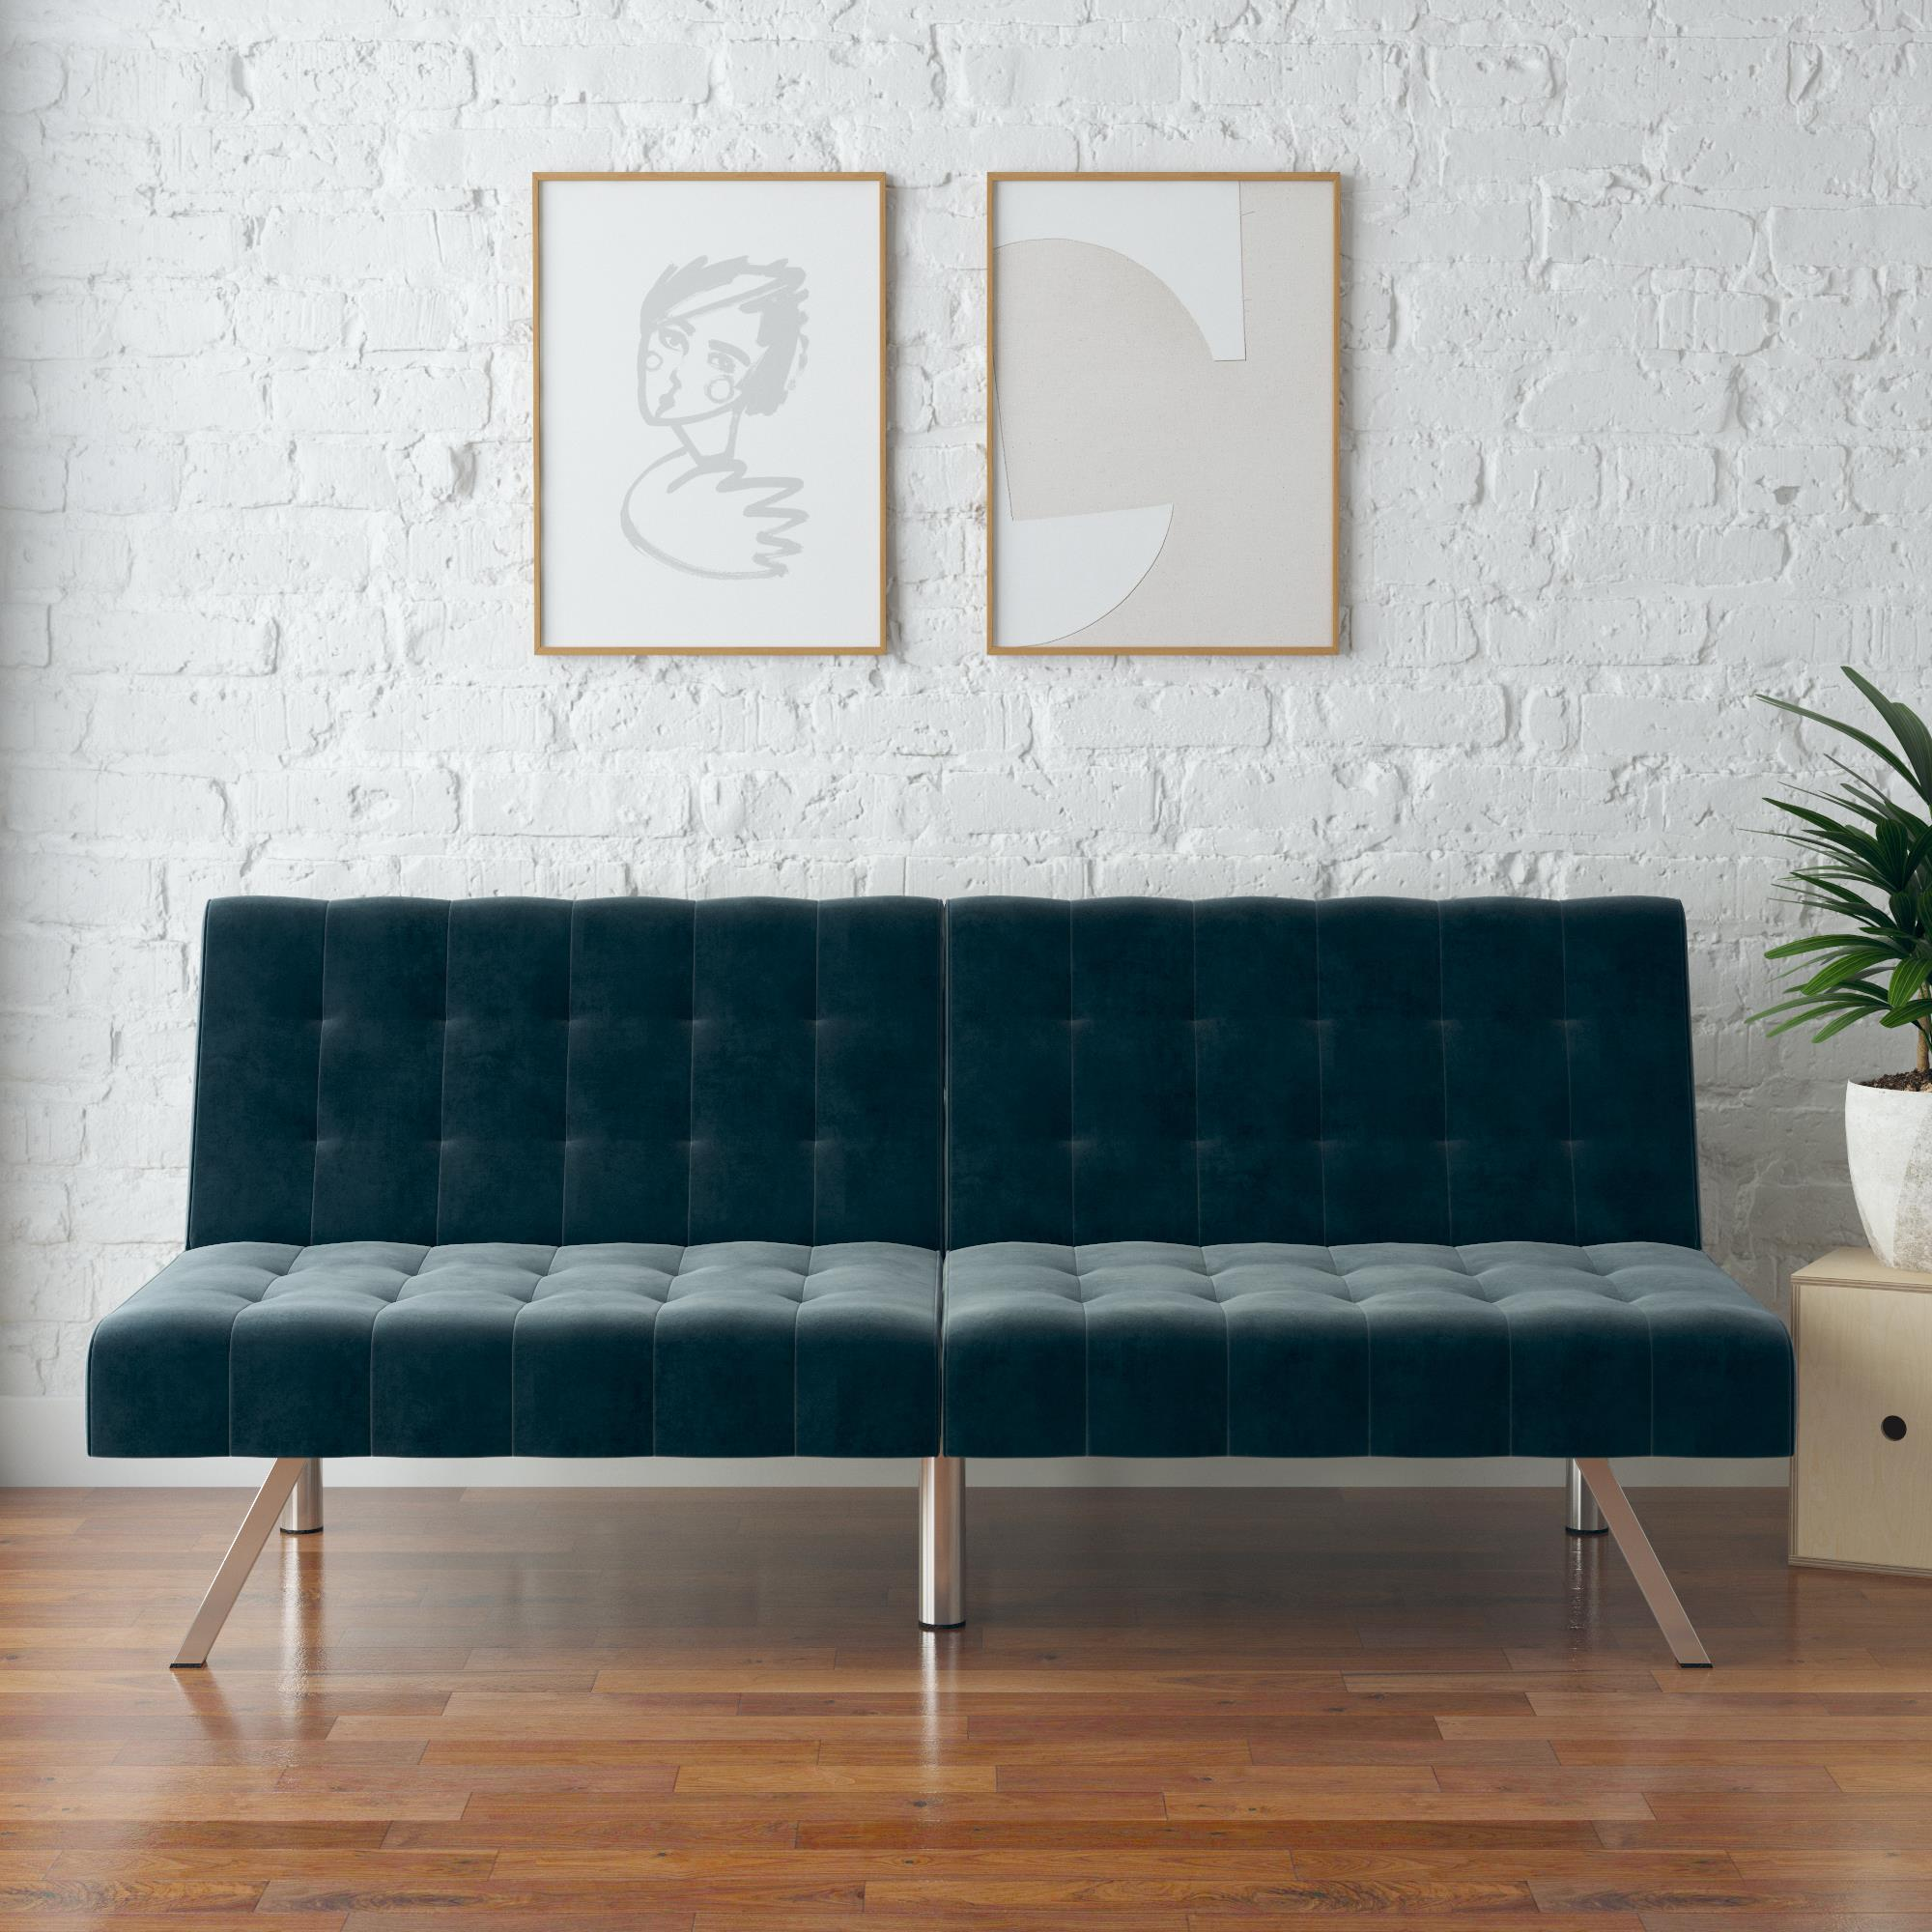 mainstays morgan futon convertible sofa bed and couch blue velvet walmart com